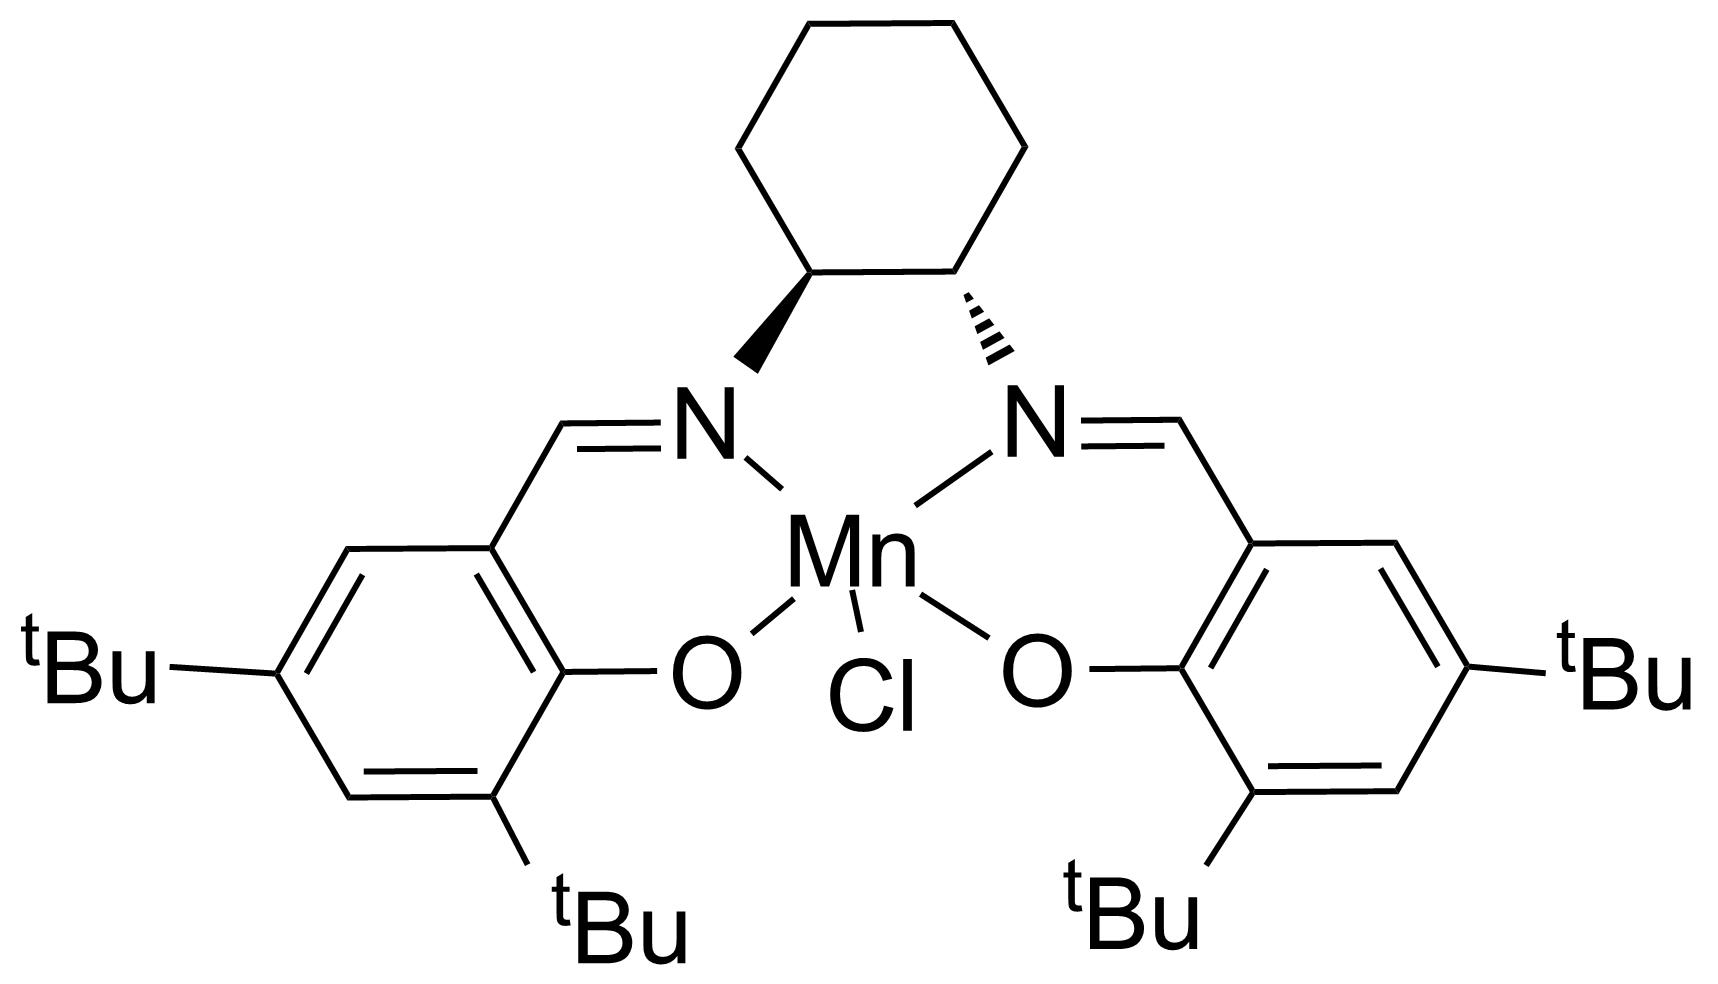 Structure of (S,S)-(+)-N,N'-Bis(3,5-di-tert-butylsalicylidene)-1,2-cyclohexanediaminomanganese(III) chloride